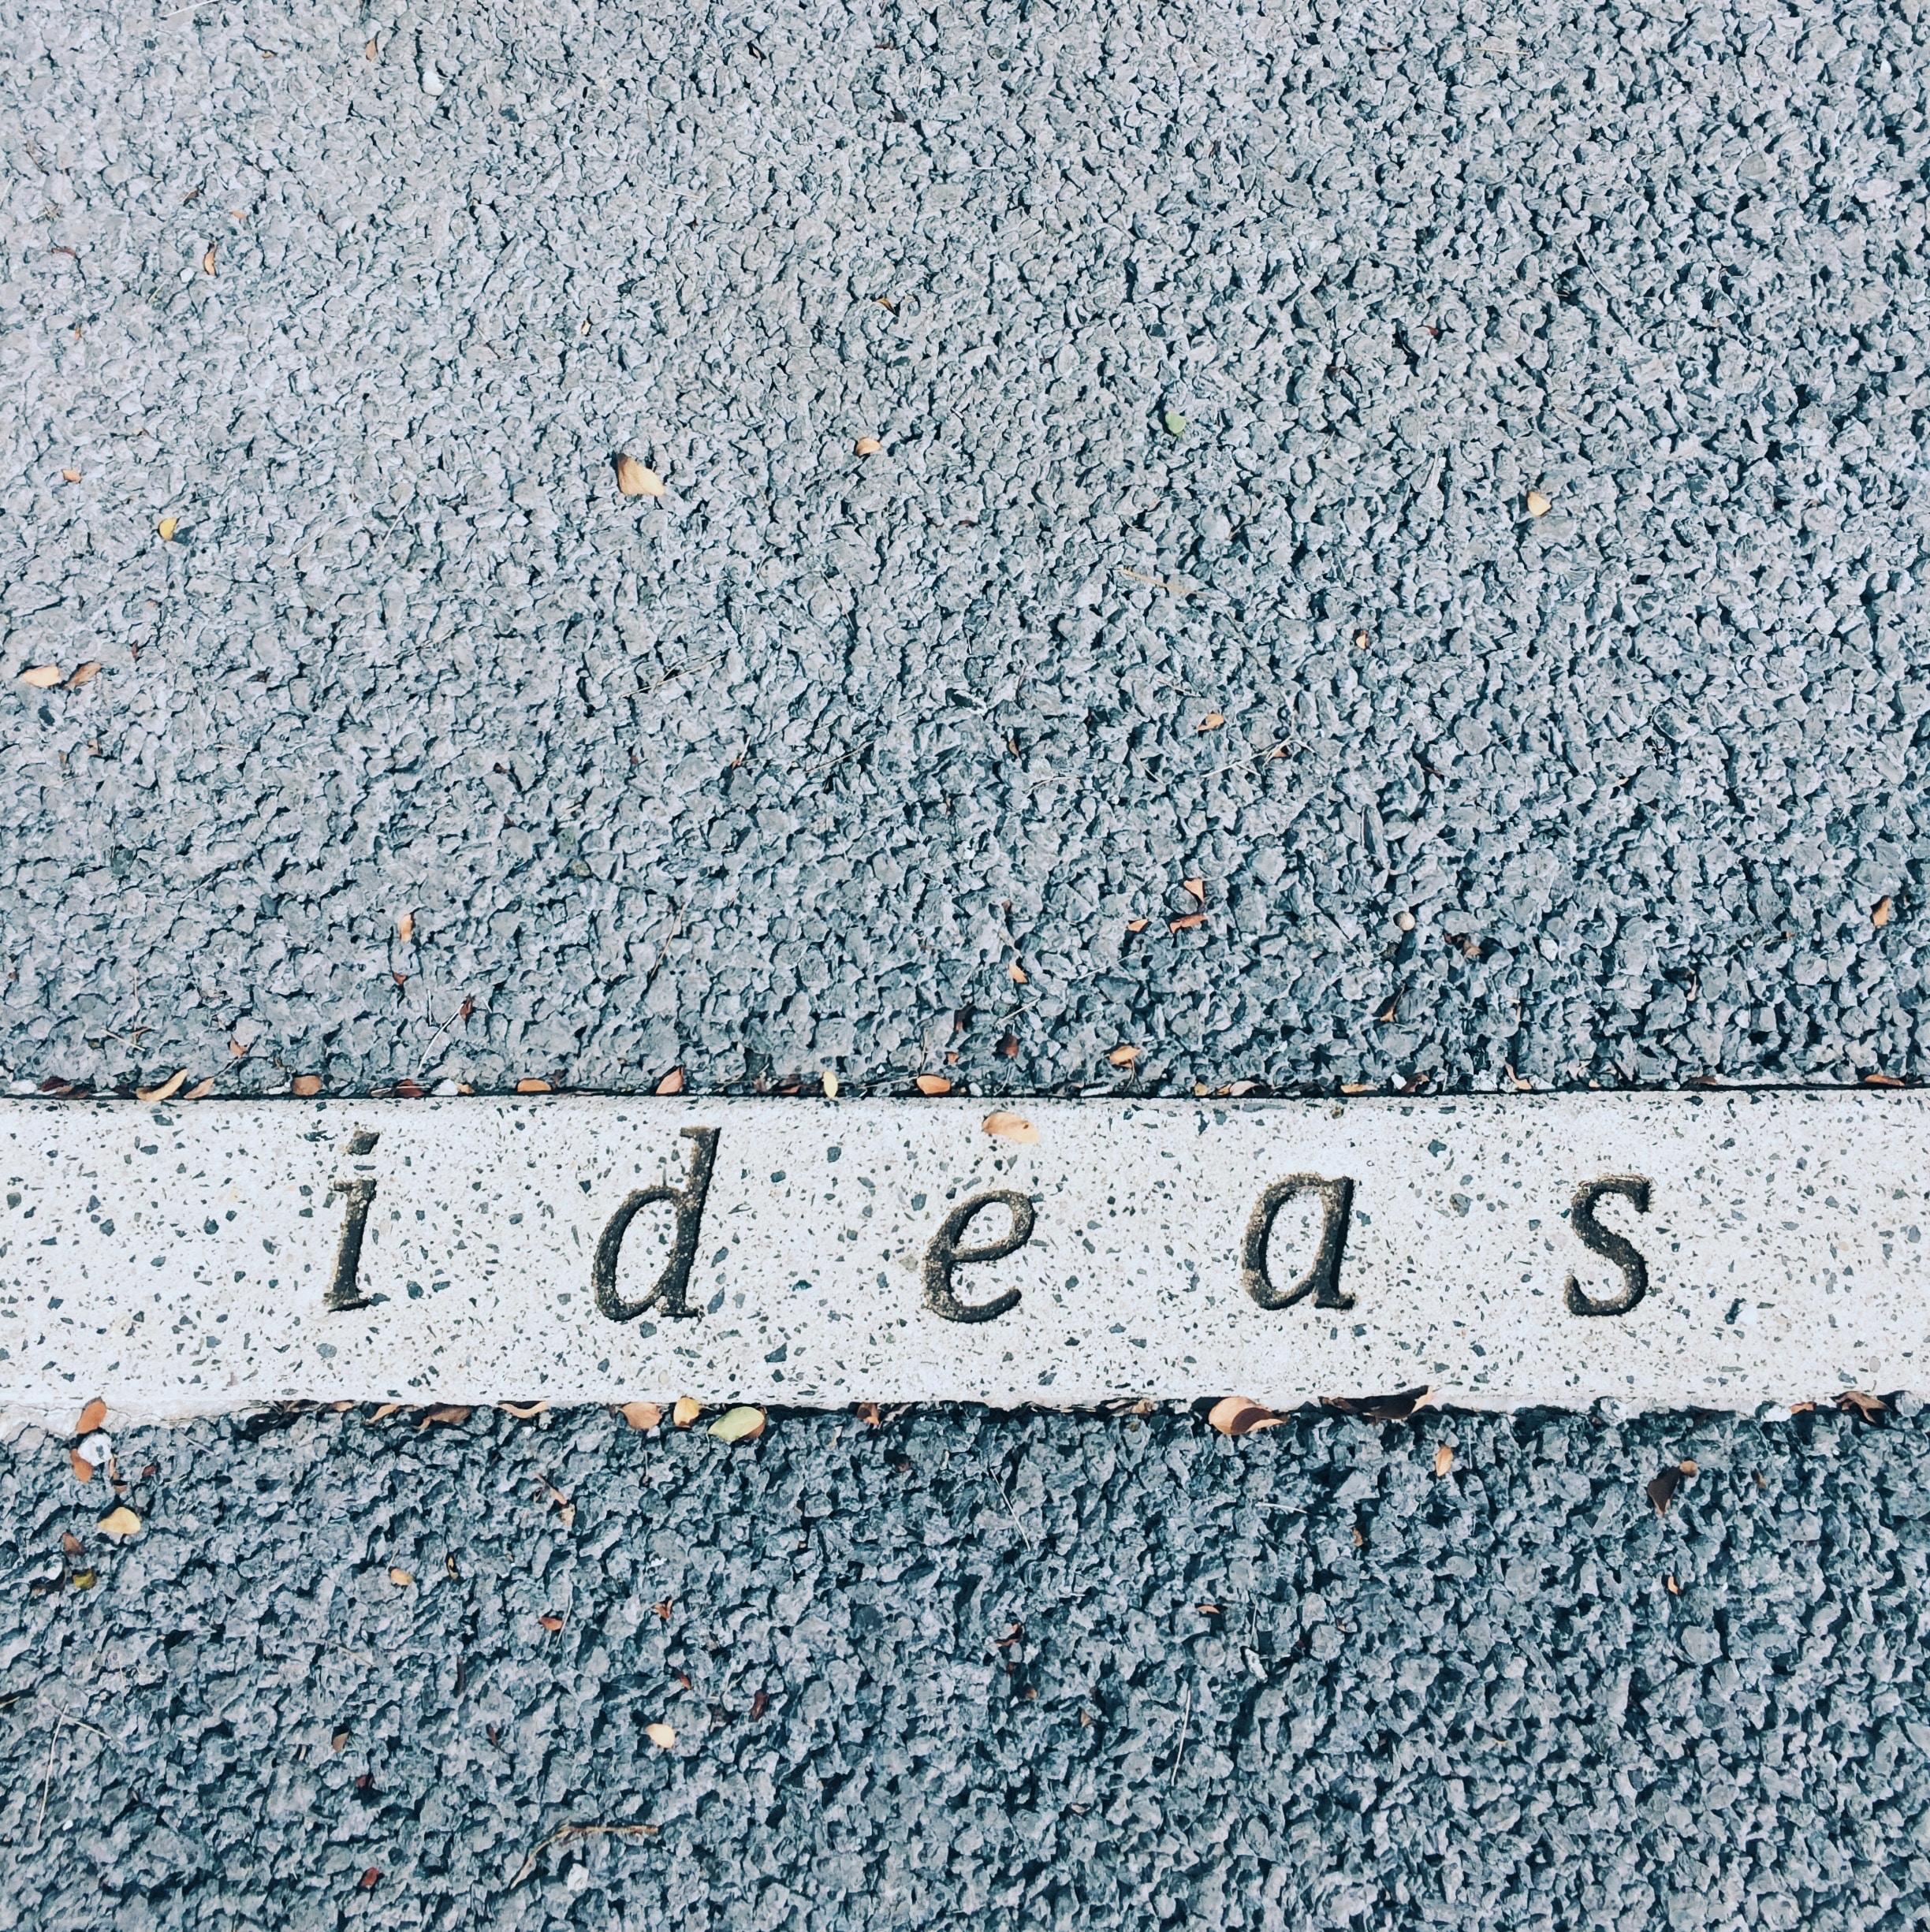 Demystifying marketing & communication